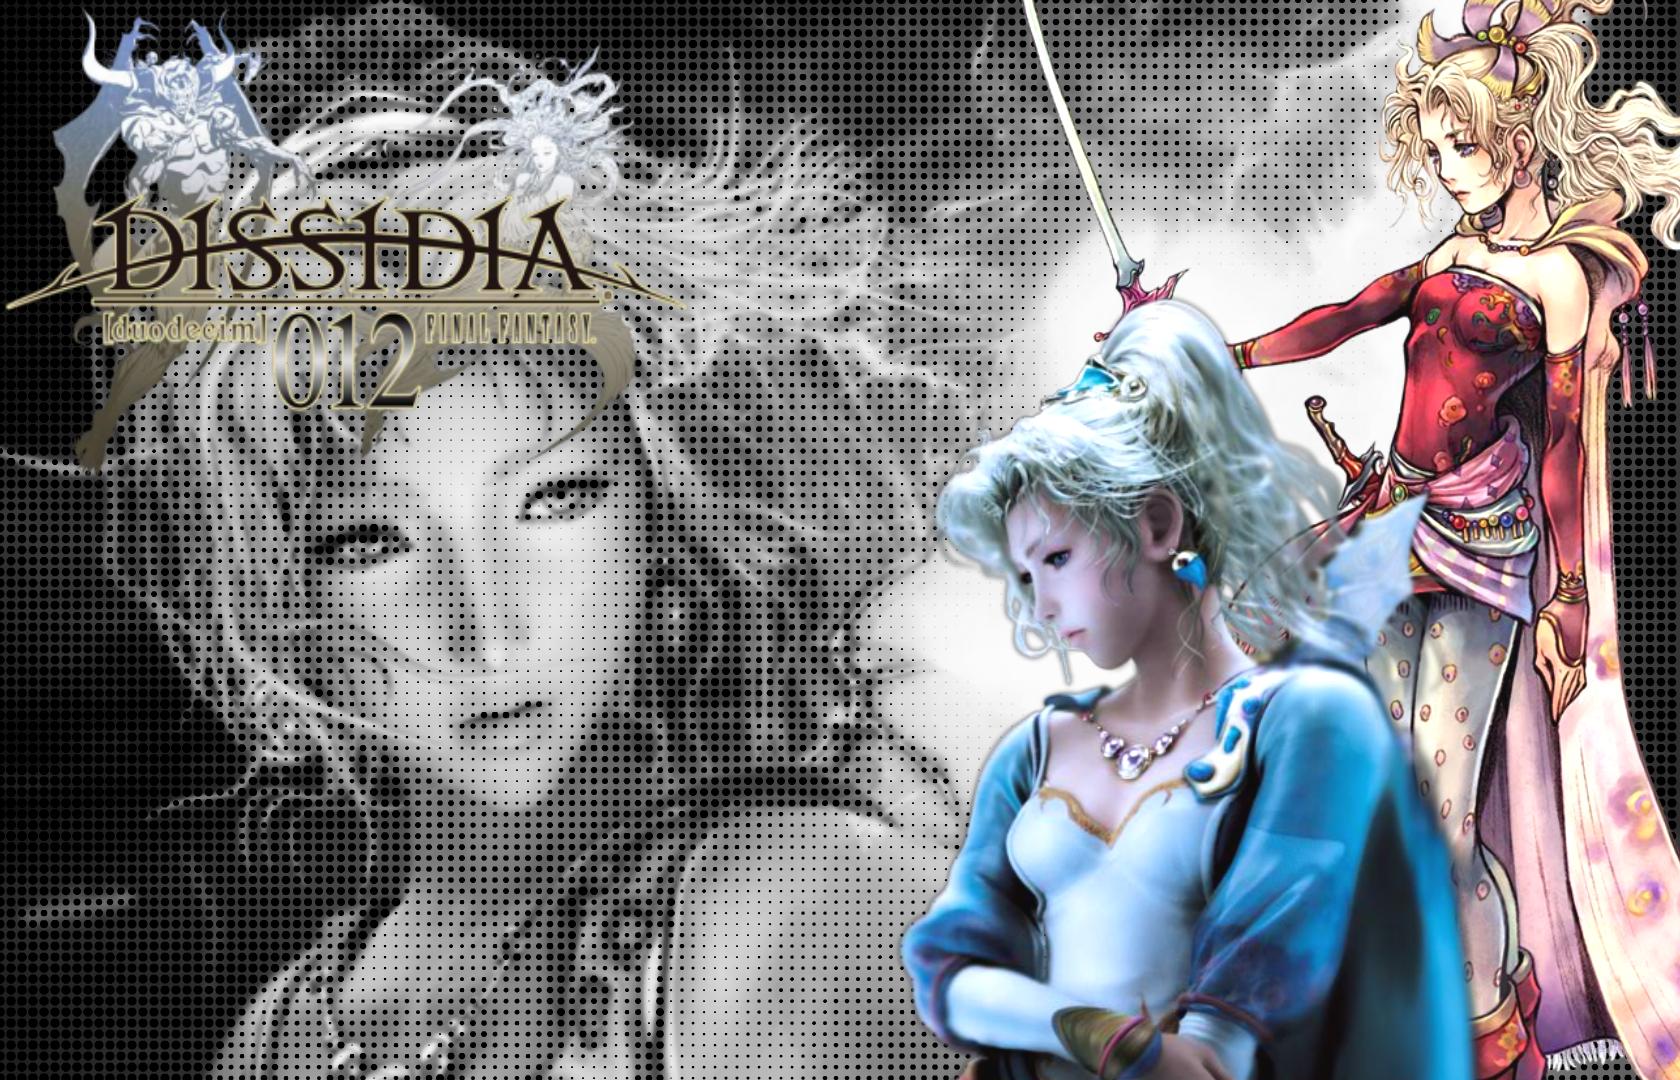 Terra Wallpaper By Ekumimi On Deviantart Final Fantasy Vi Graphic Novel Wallpaper